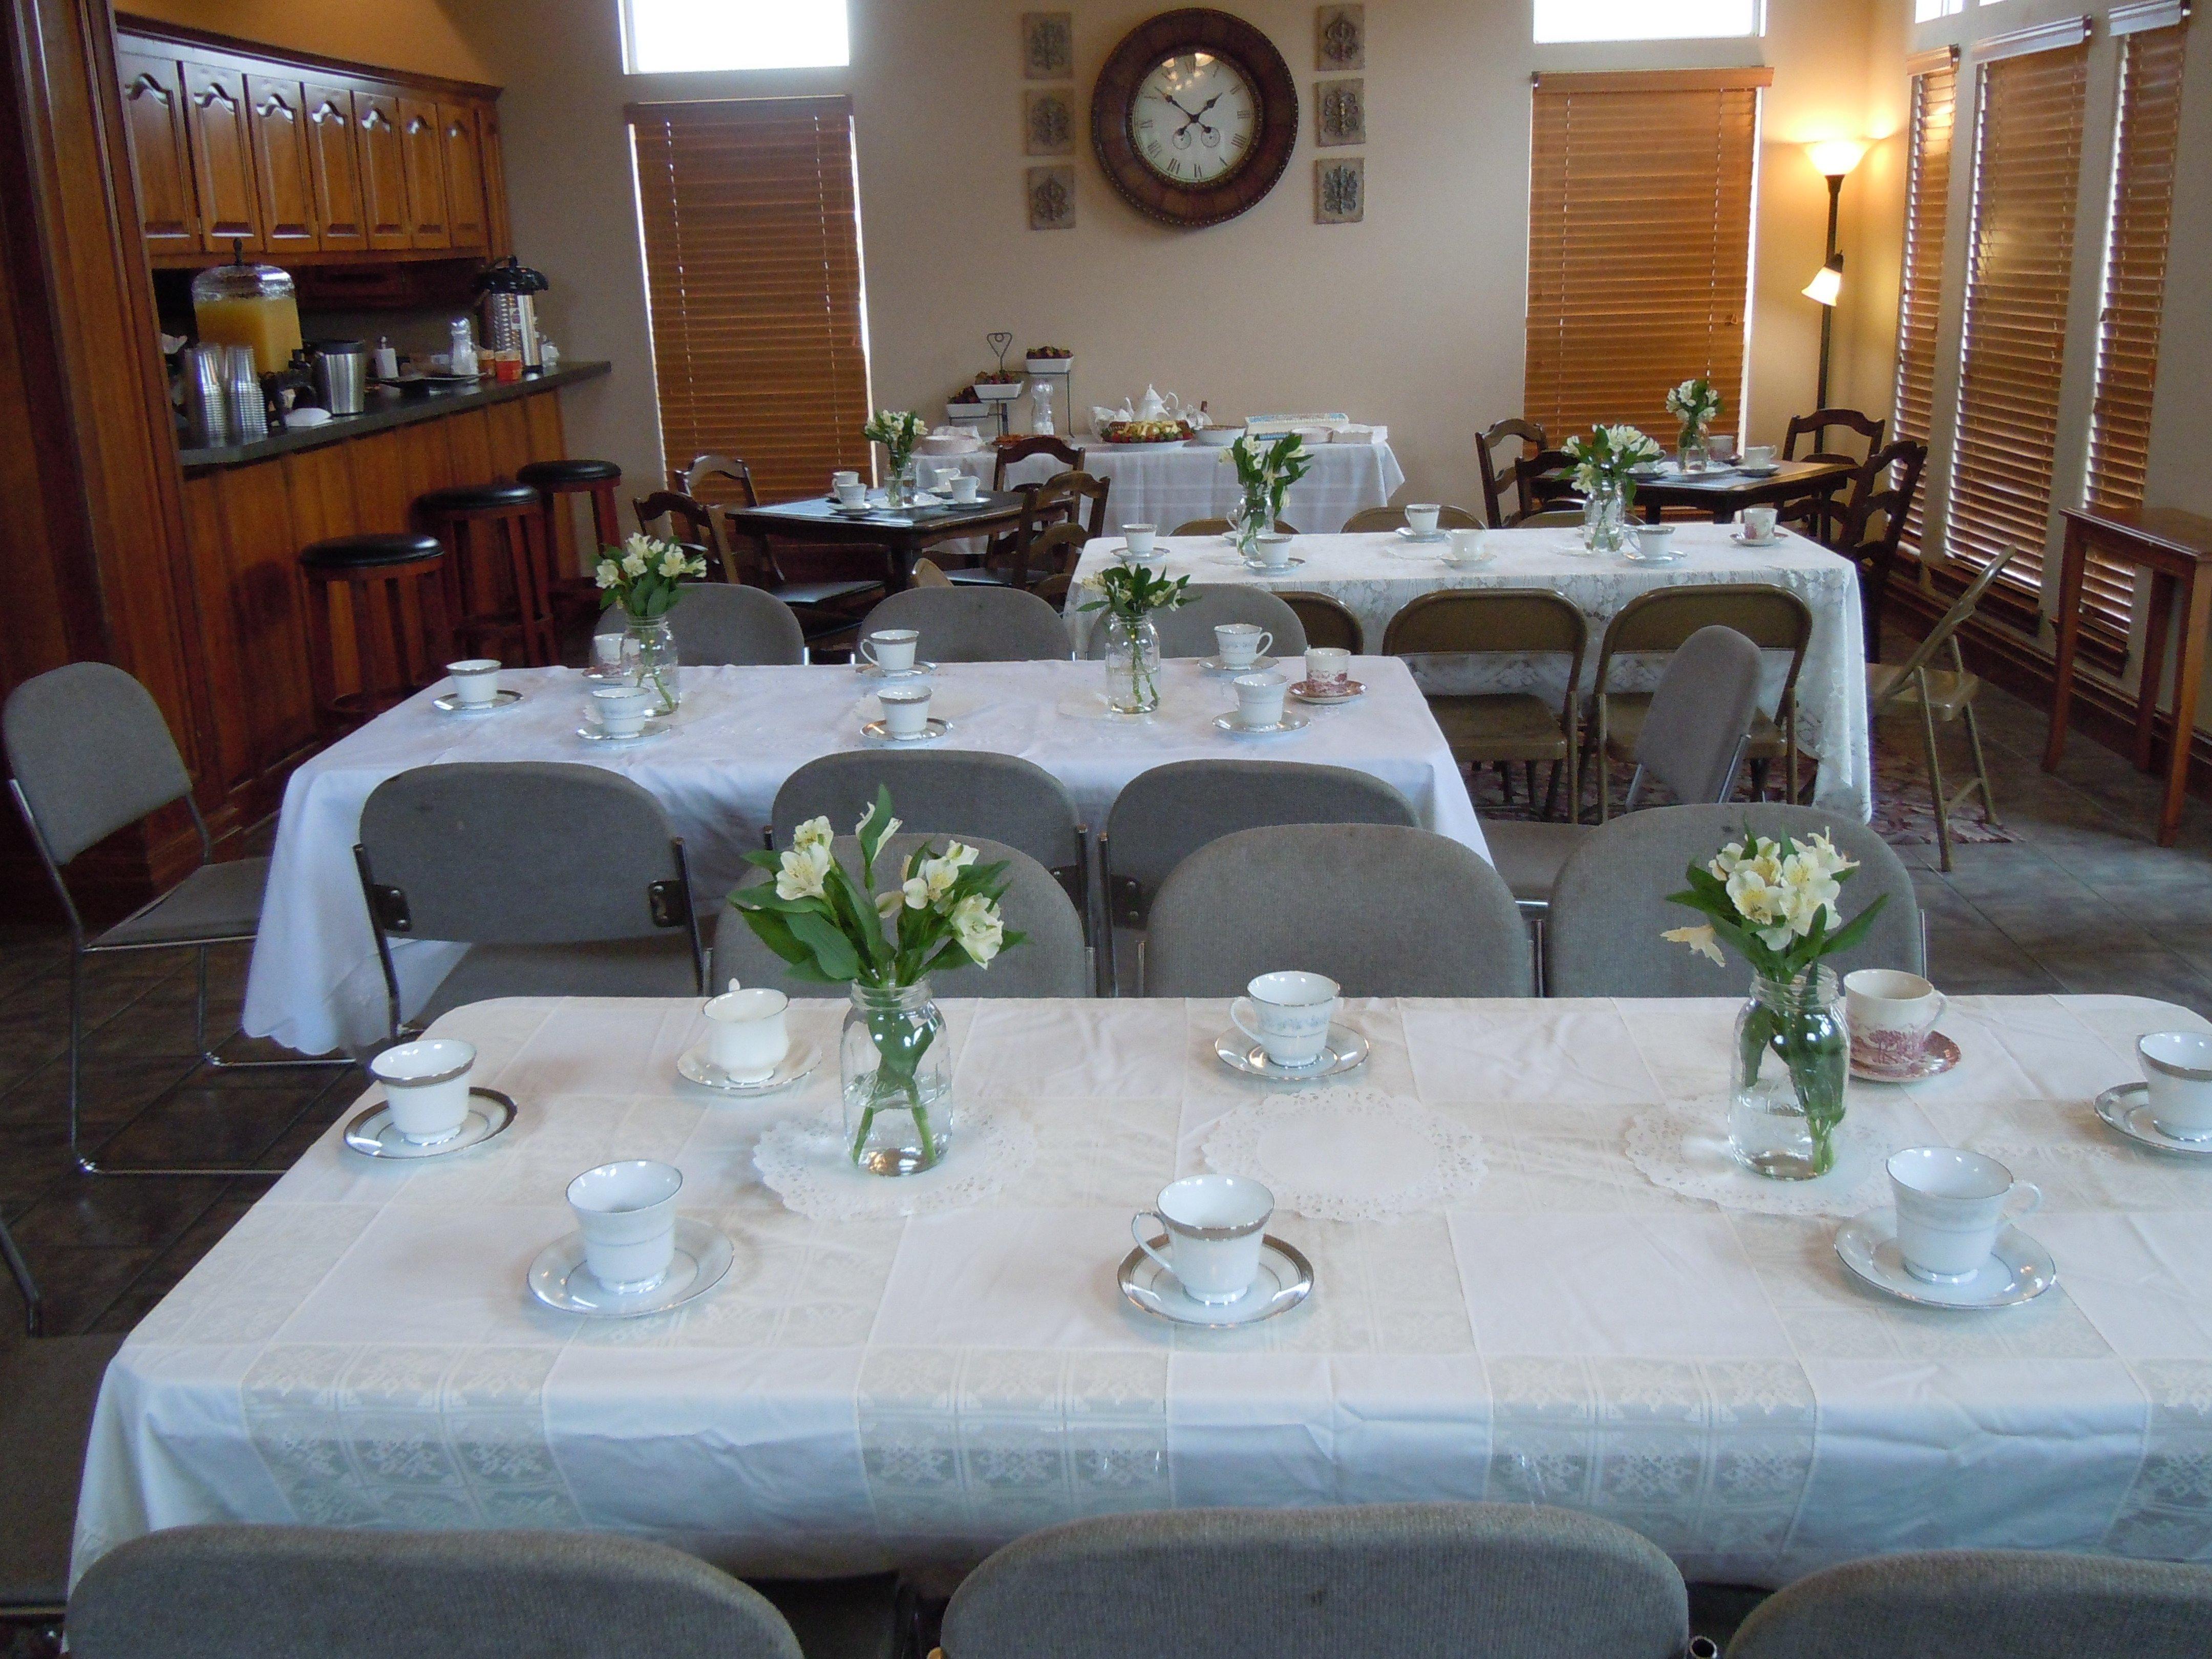 10 Beautiful Birthday Dinner Ideas For Mom celebration 4 moms 60th birthday life through my eyes